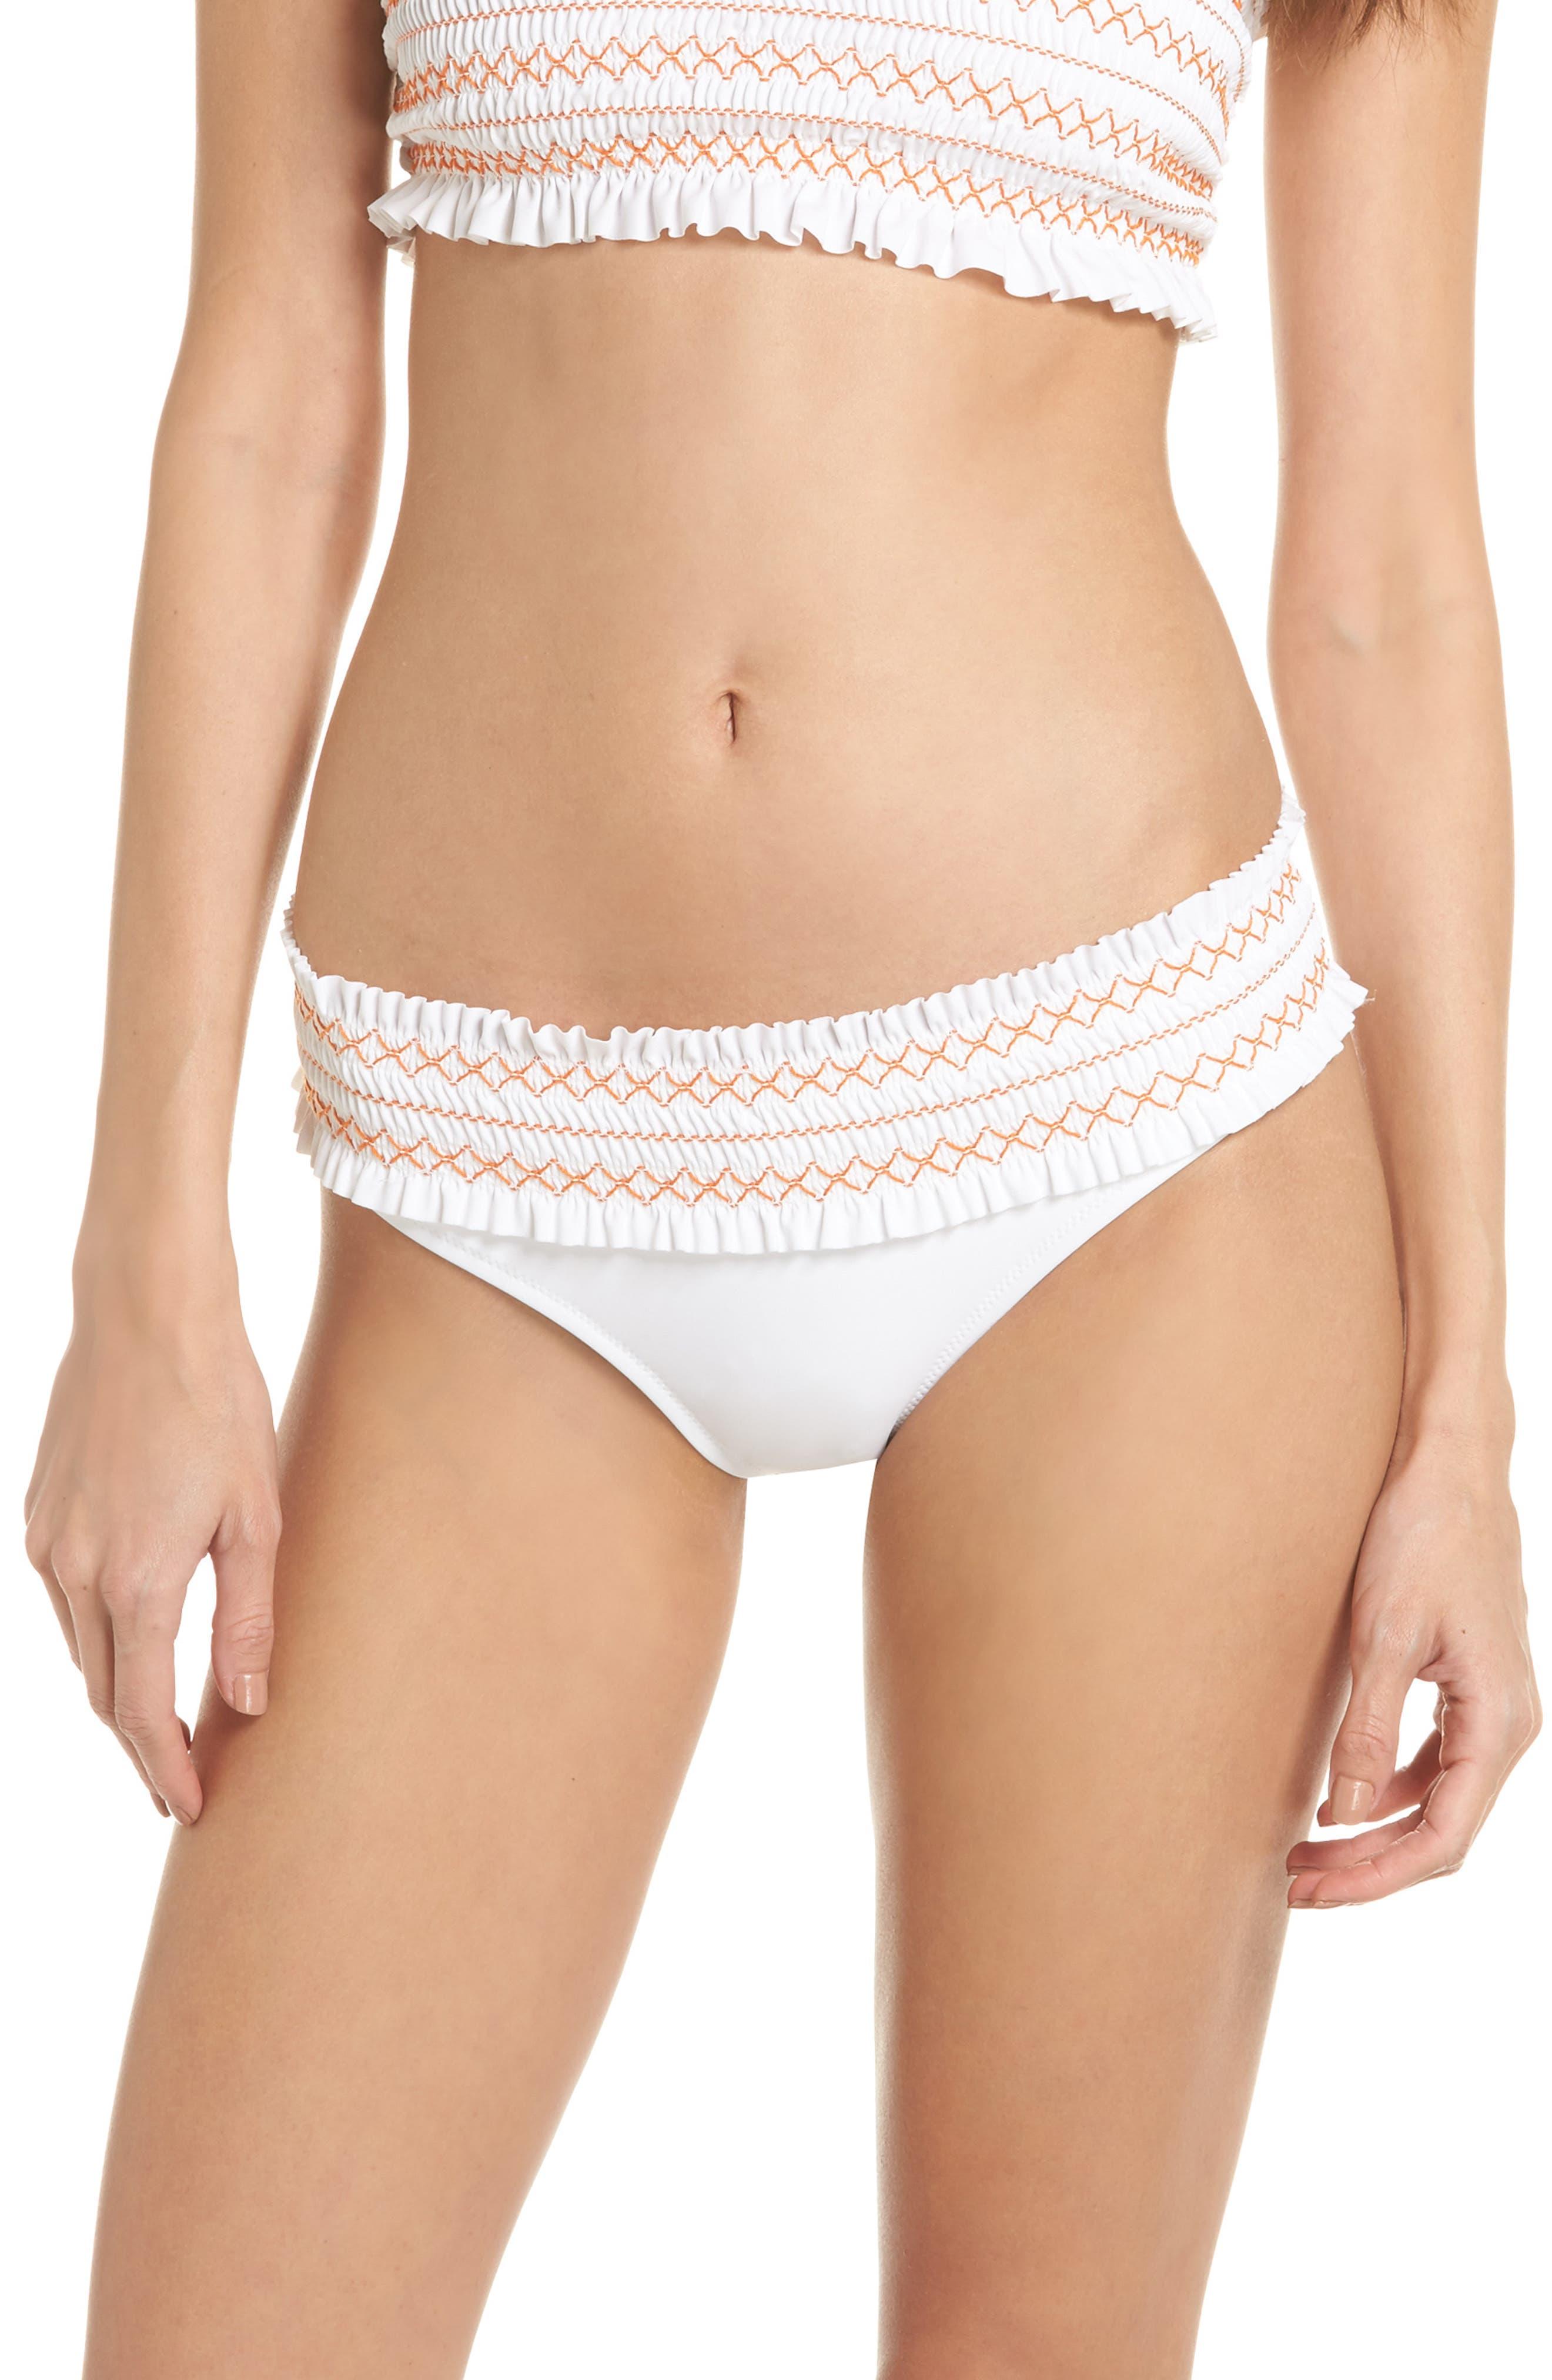 Main Image - Tory Burch Costa Smocked Hipster Bikini Bottoms